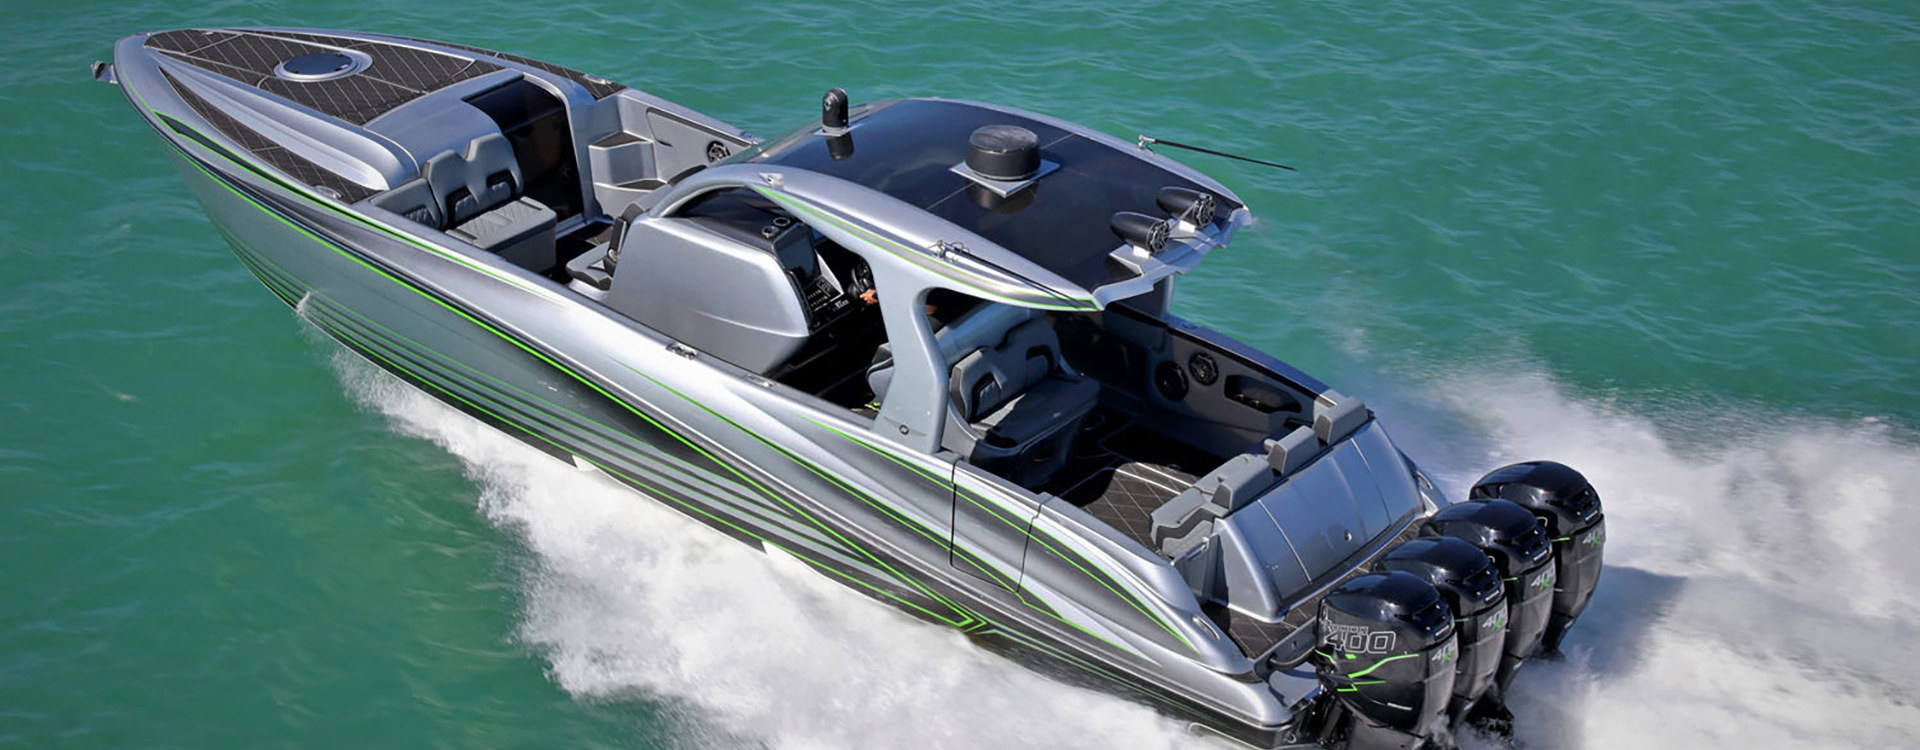 Deep Impact 399 Cabin boat